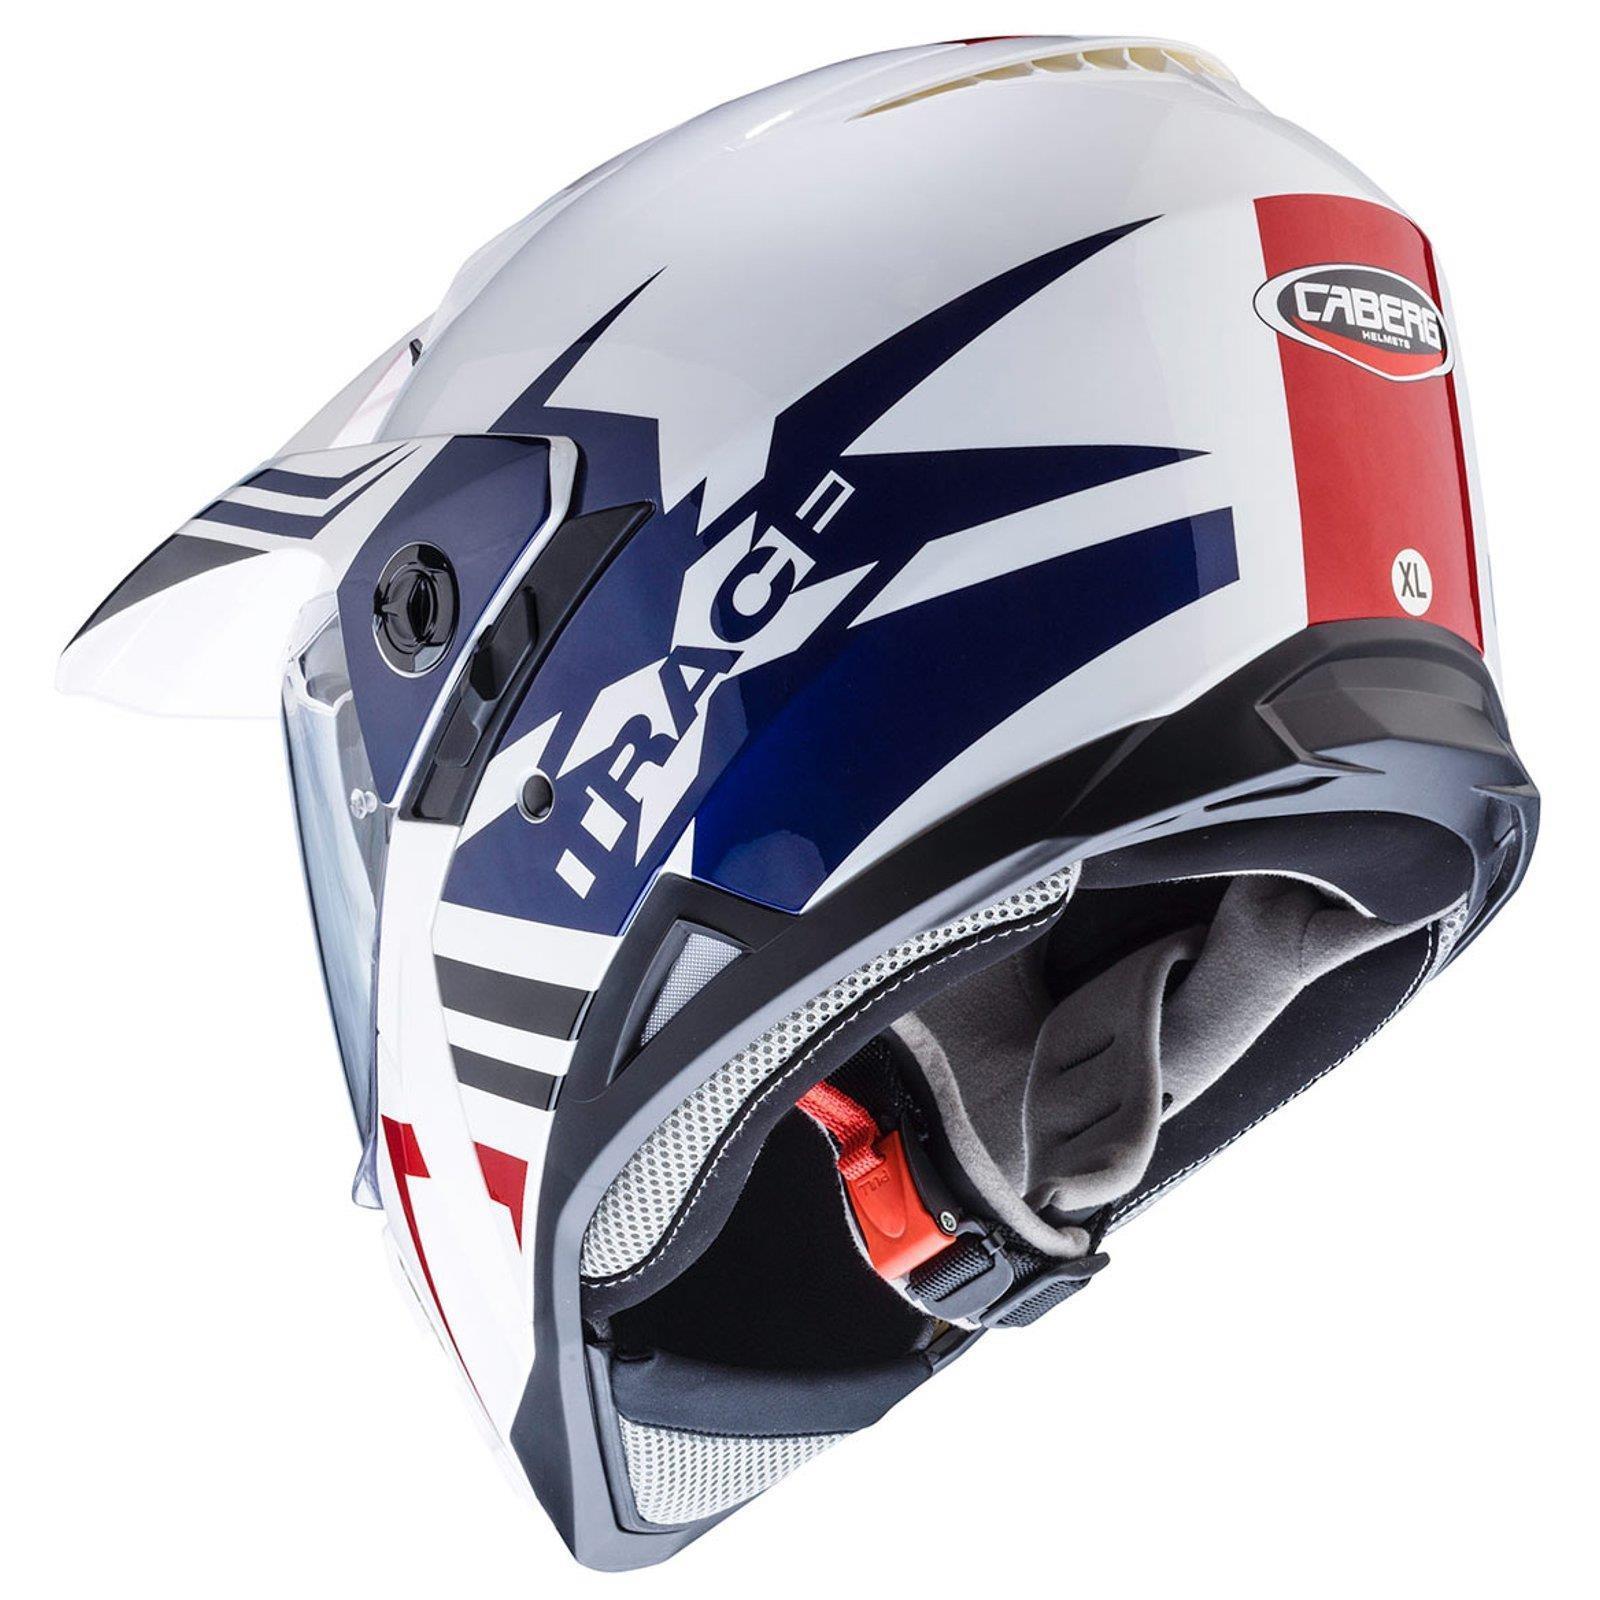 Caberg-Xtrace-Lux-Weiss-Rot-Blau-MX-Helm-Motocross-Enduro-Pinlock-Schild-Visier